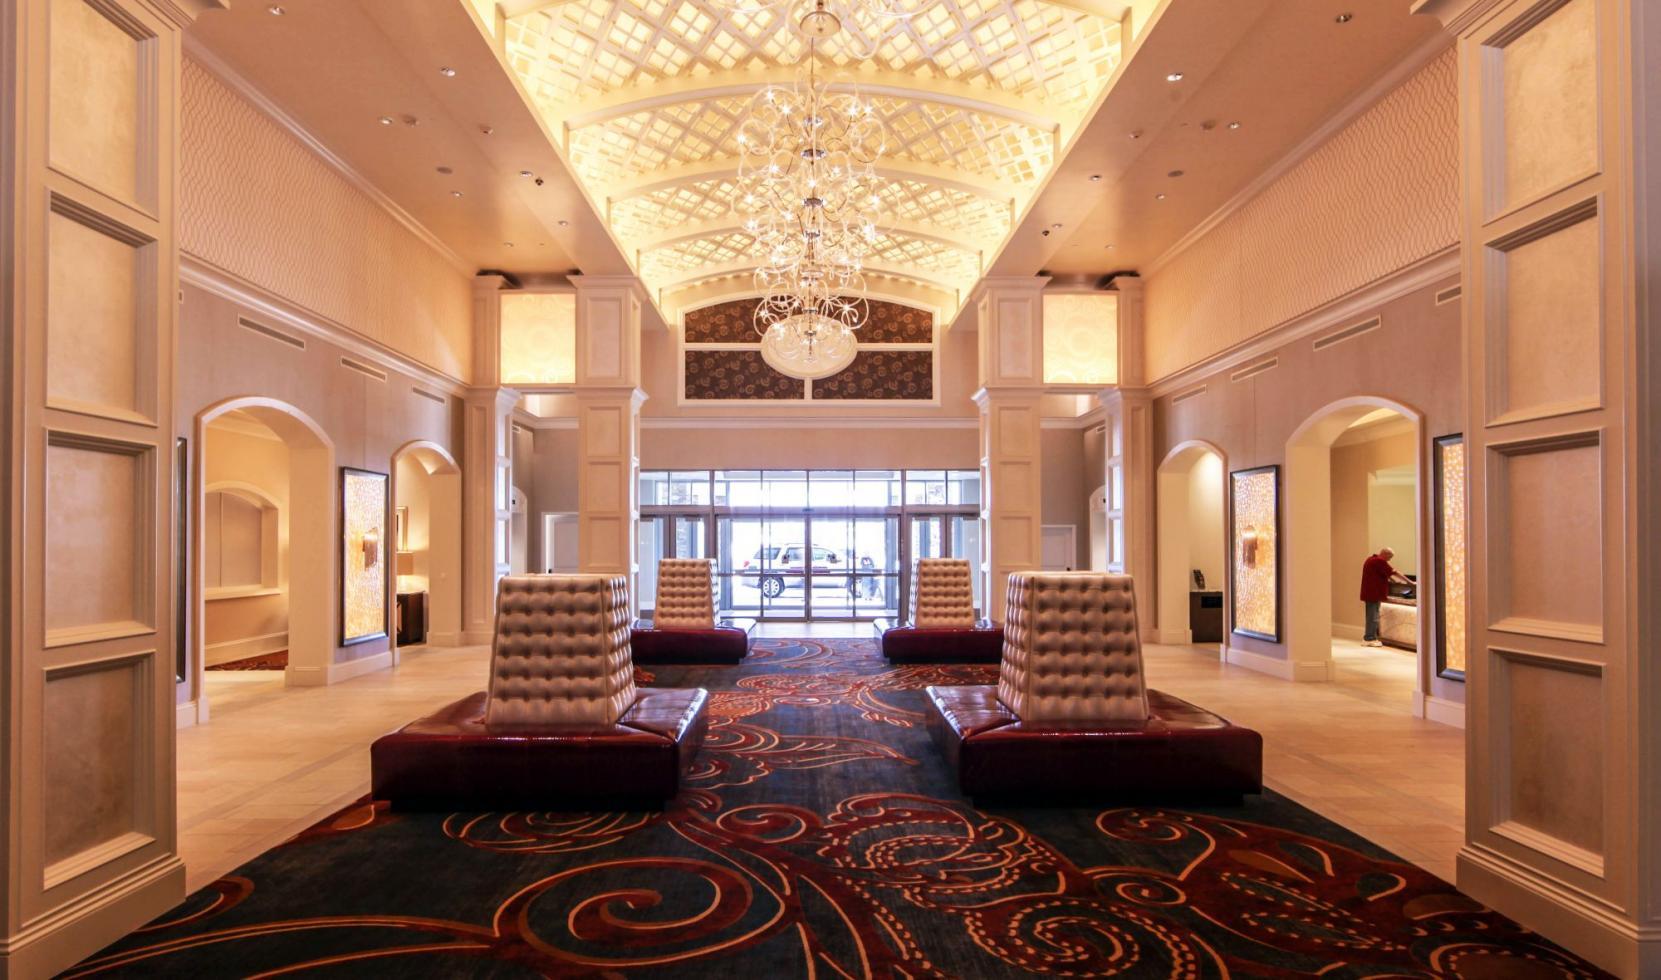 Winstar world casino hotel rates casino county diego san